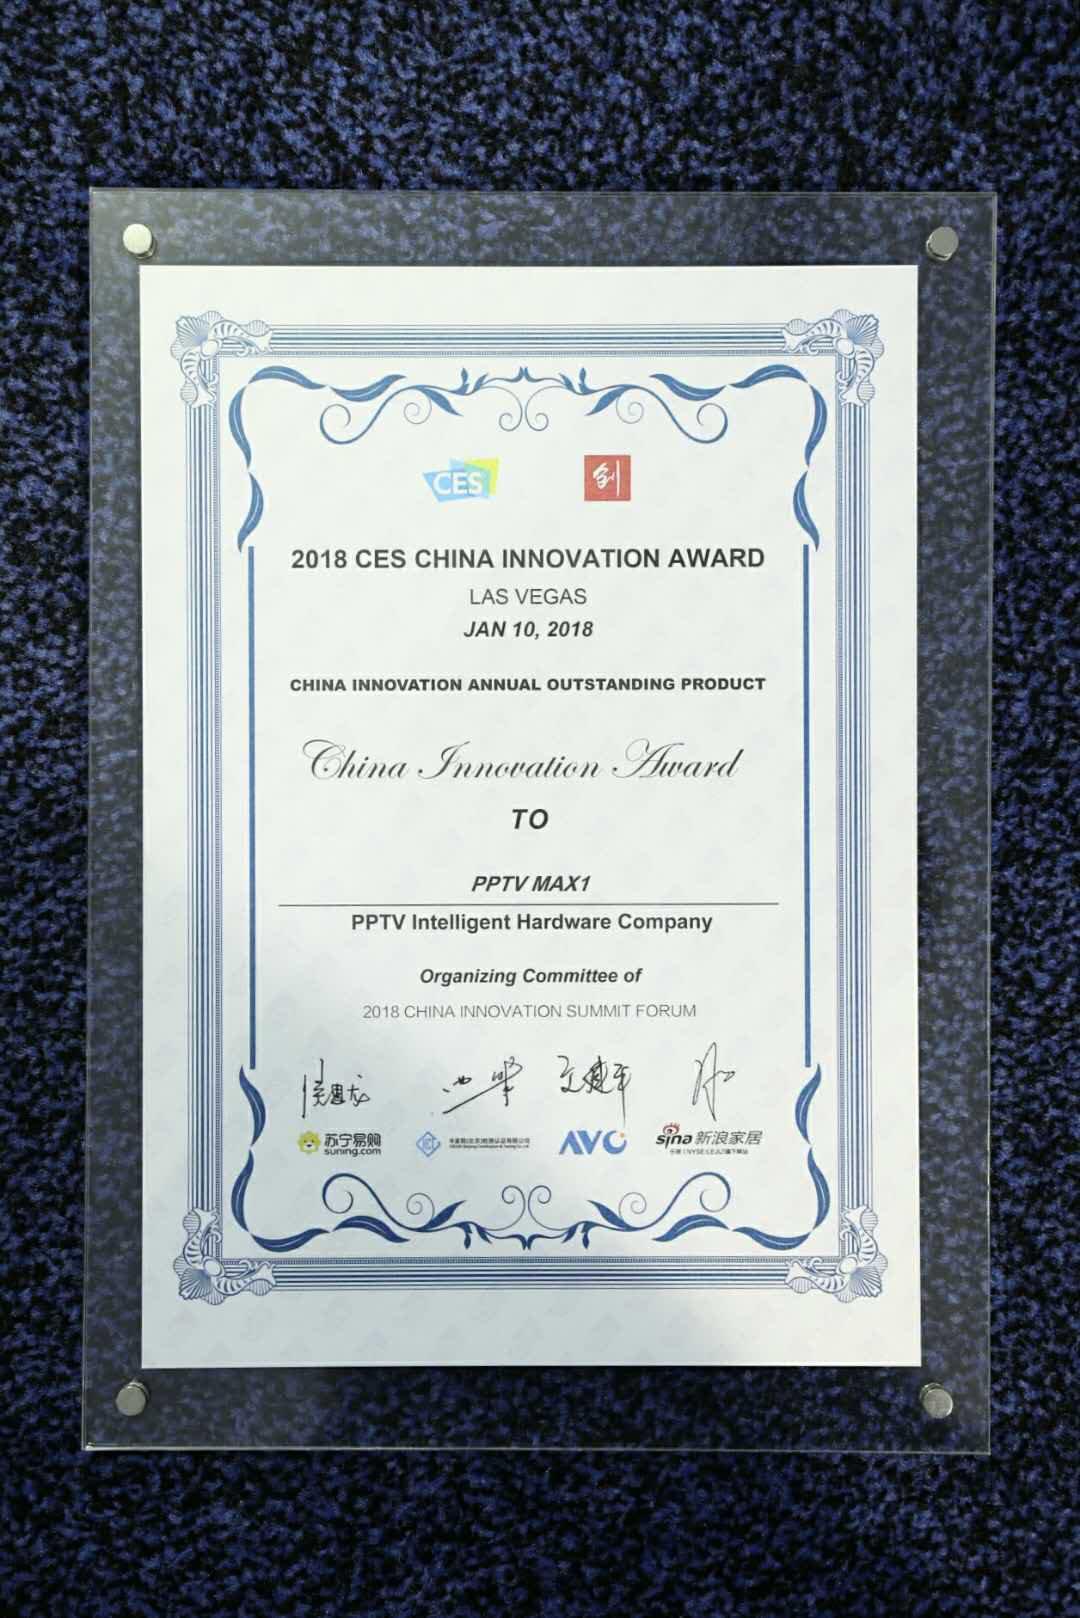 PPTV激光电视参展2018CES 荣获中国创造奖